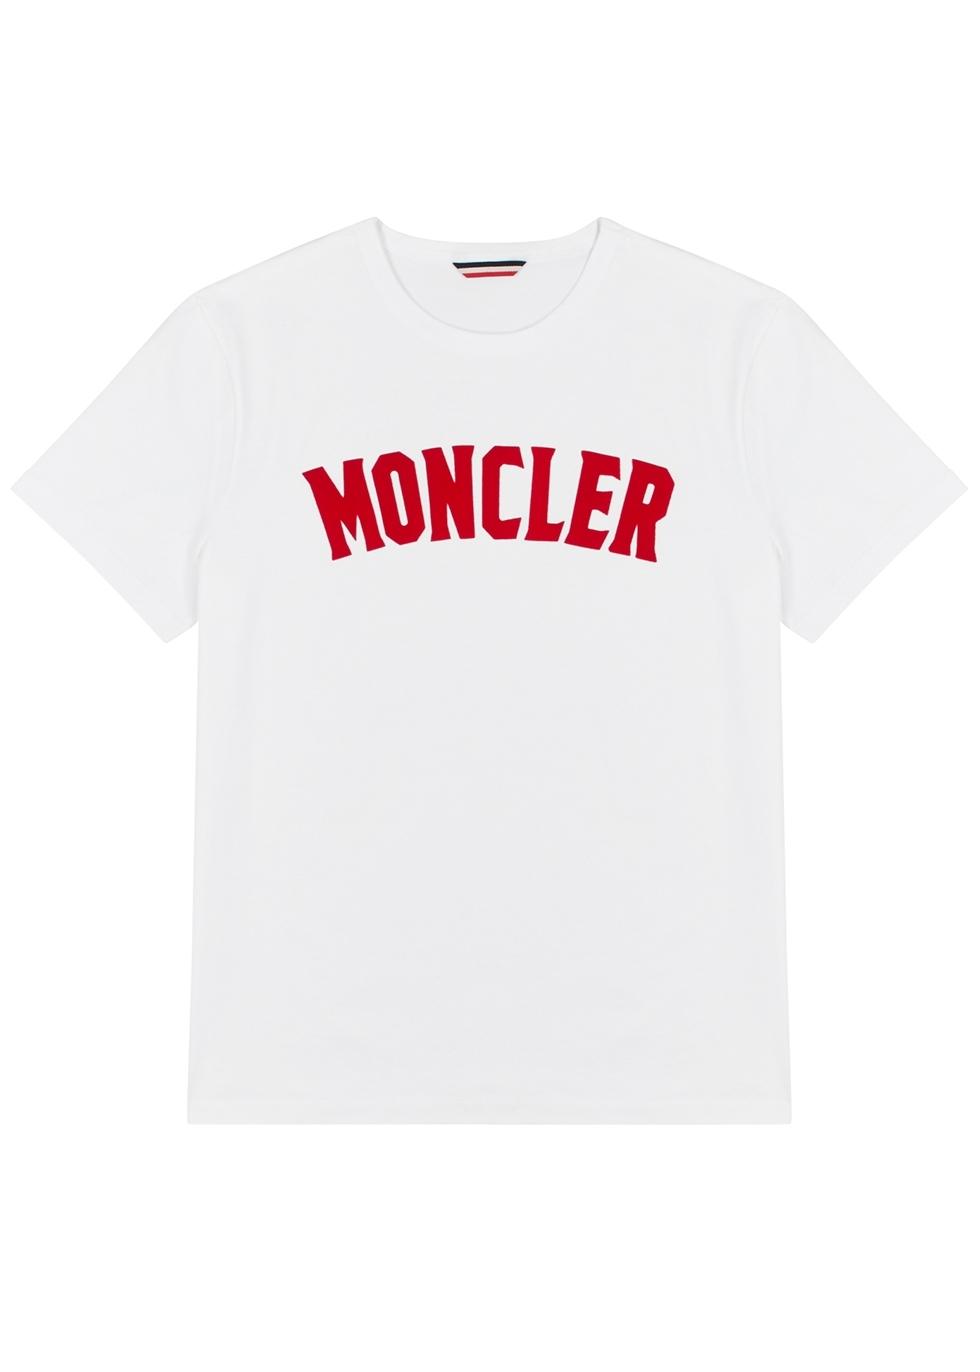 e42acd3fa Moncler Genius 1952 1952 black logo-print T-shirt - Harvey Nichols